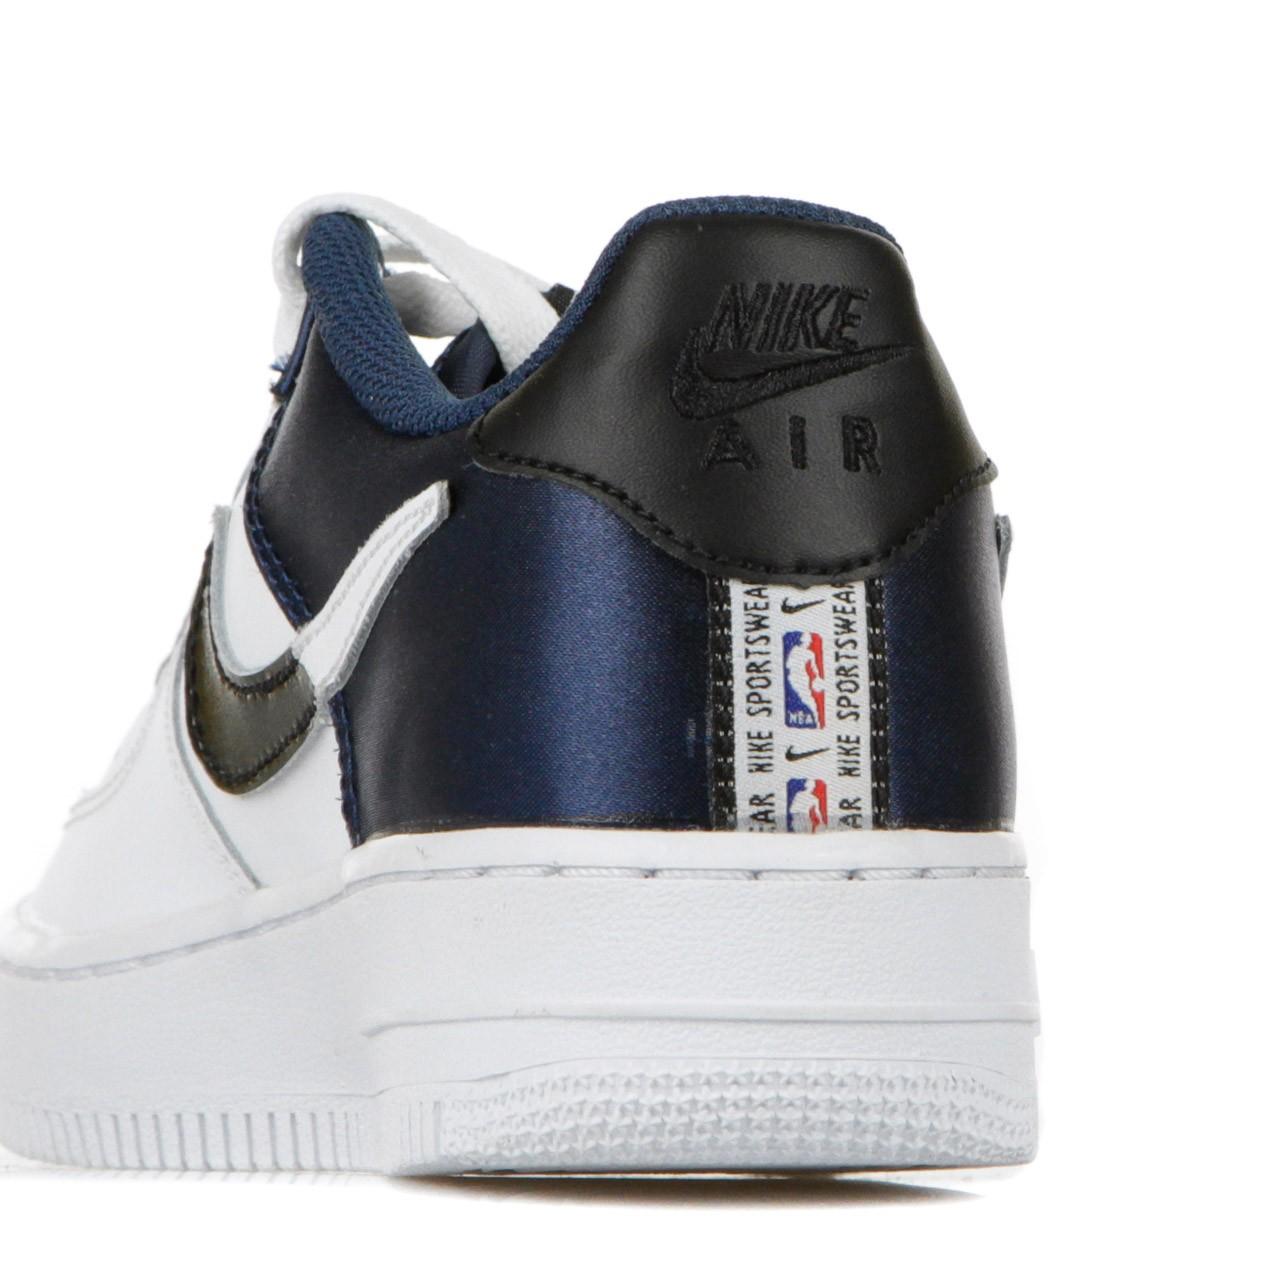 Nike Scarpa bassa bambino air force nba low CK0502-400 | Atipicisho...